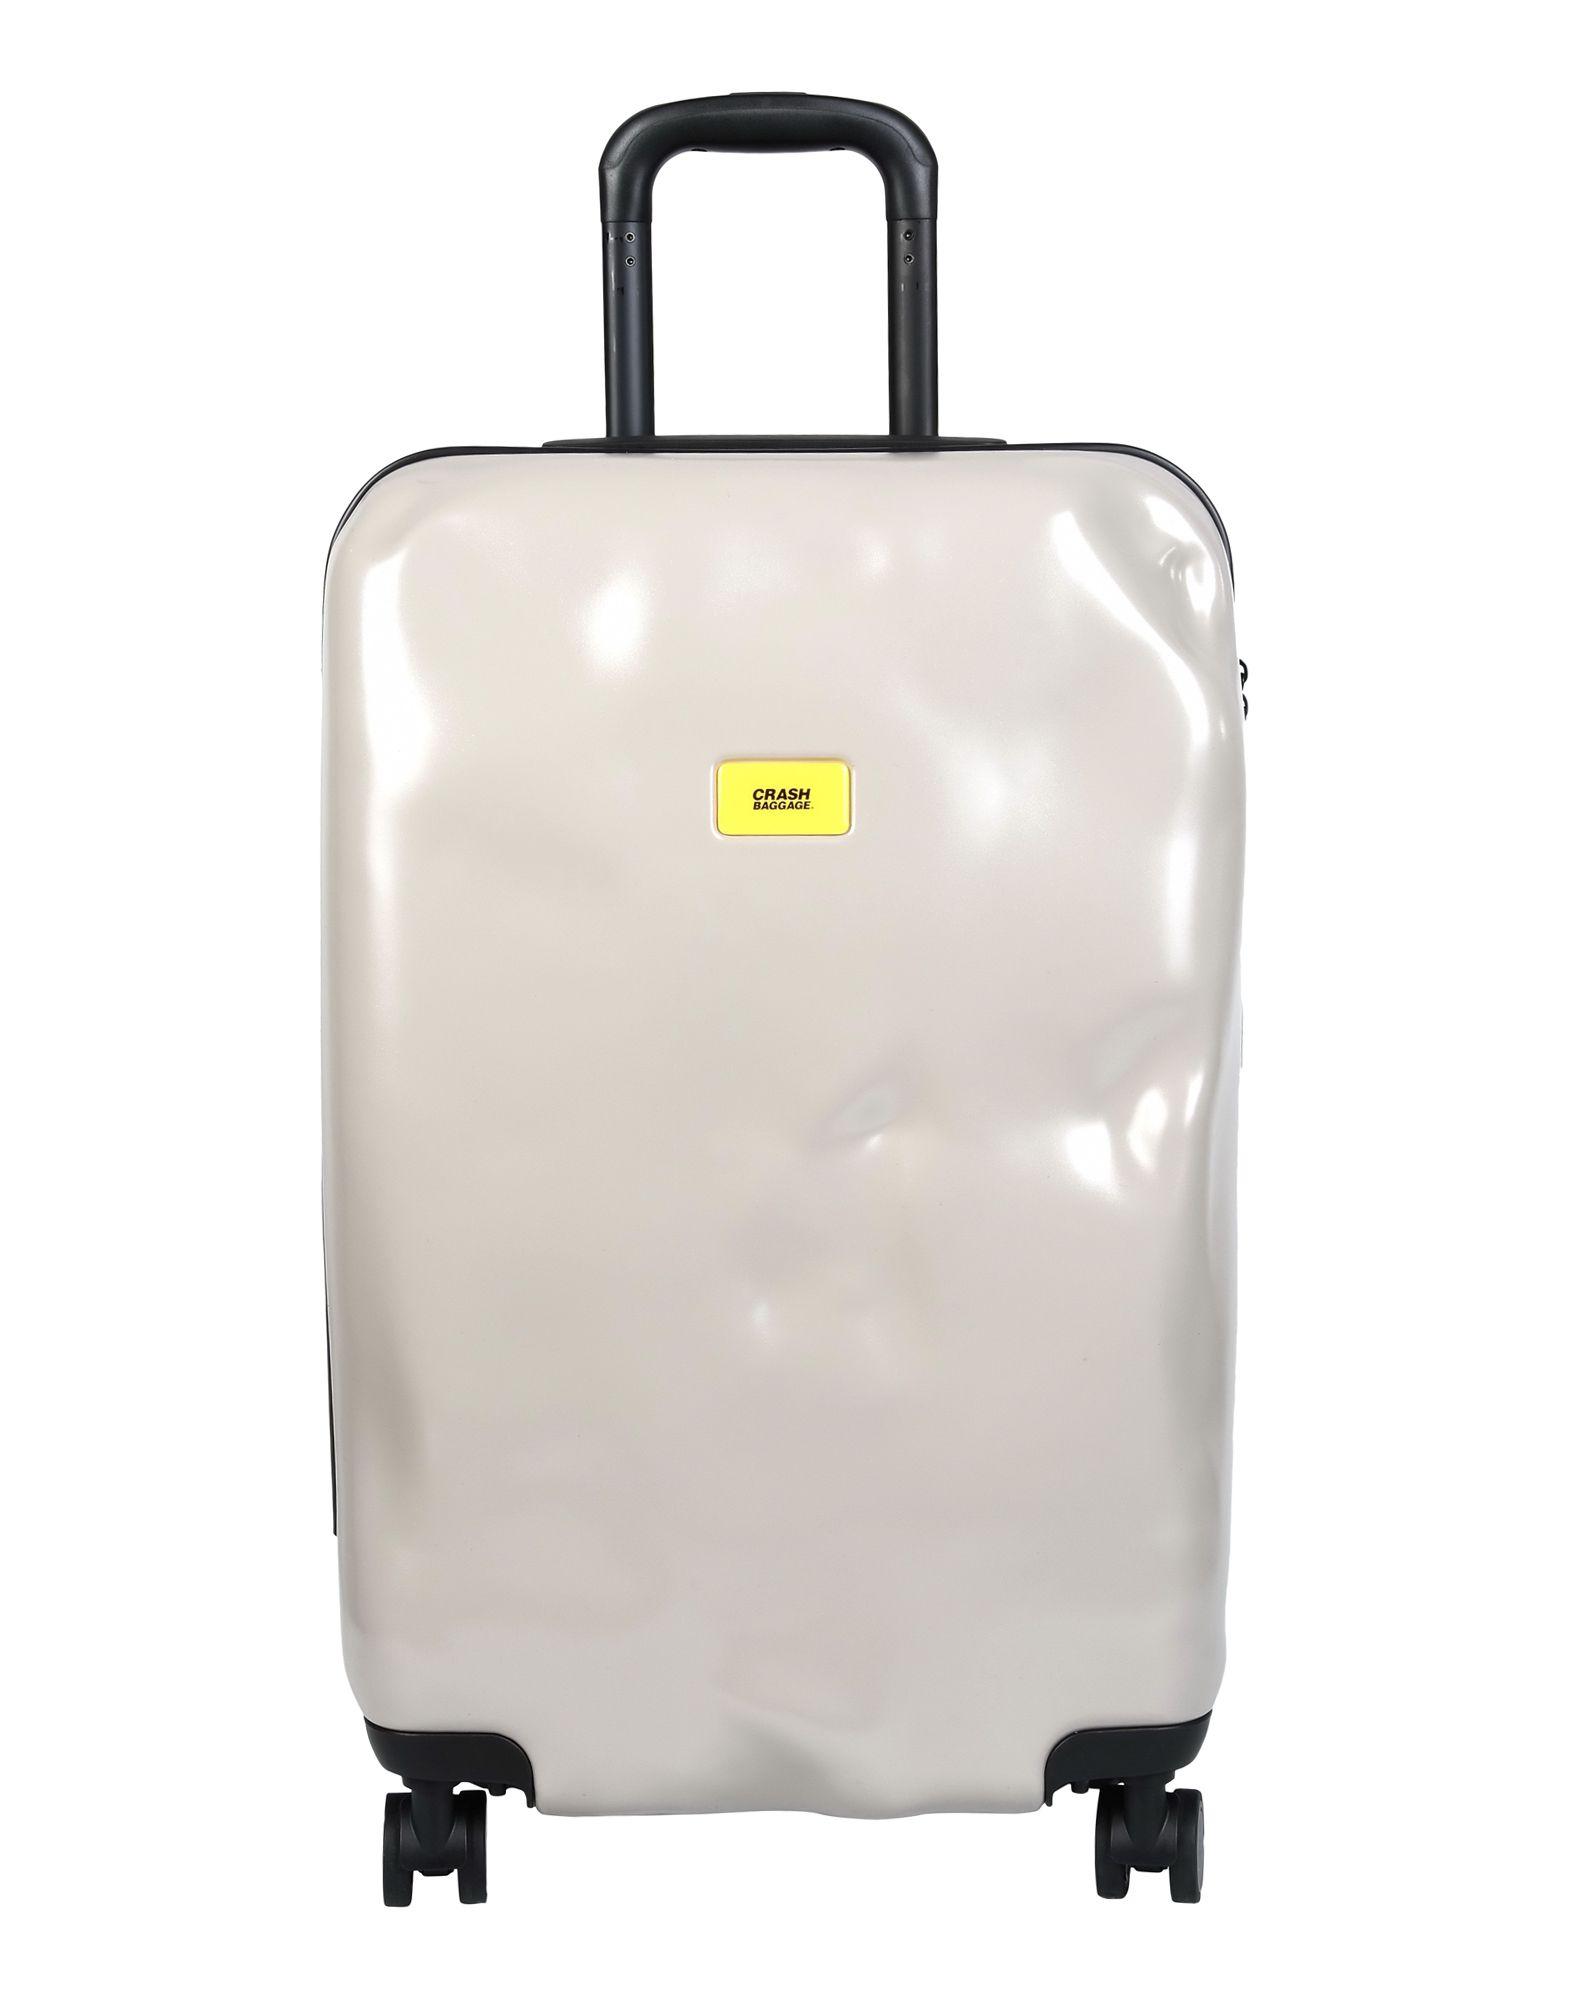 CRASH BAGGAGE Чемодан/сумка на колесиках чемодан samsonite чемодан 78 см base boost